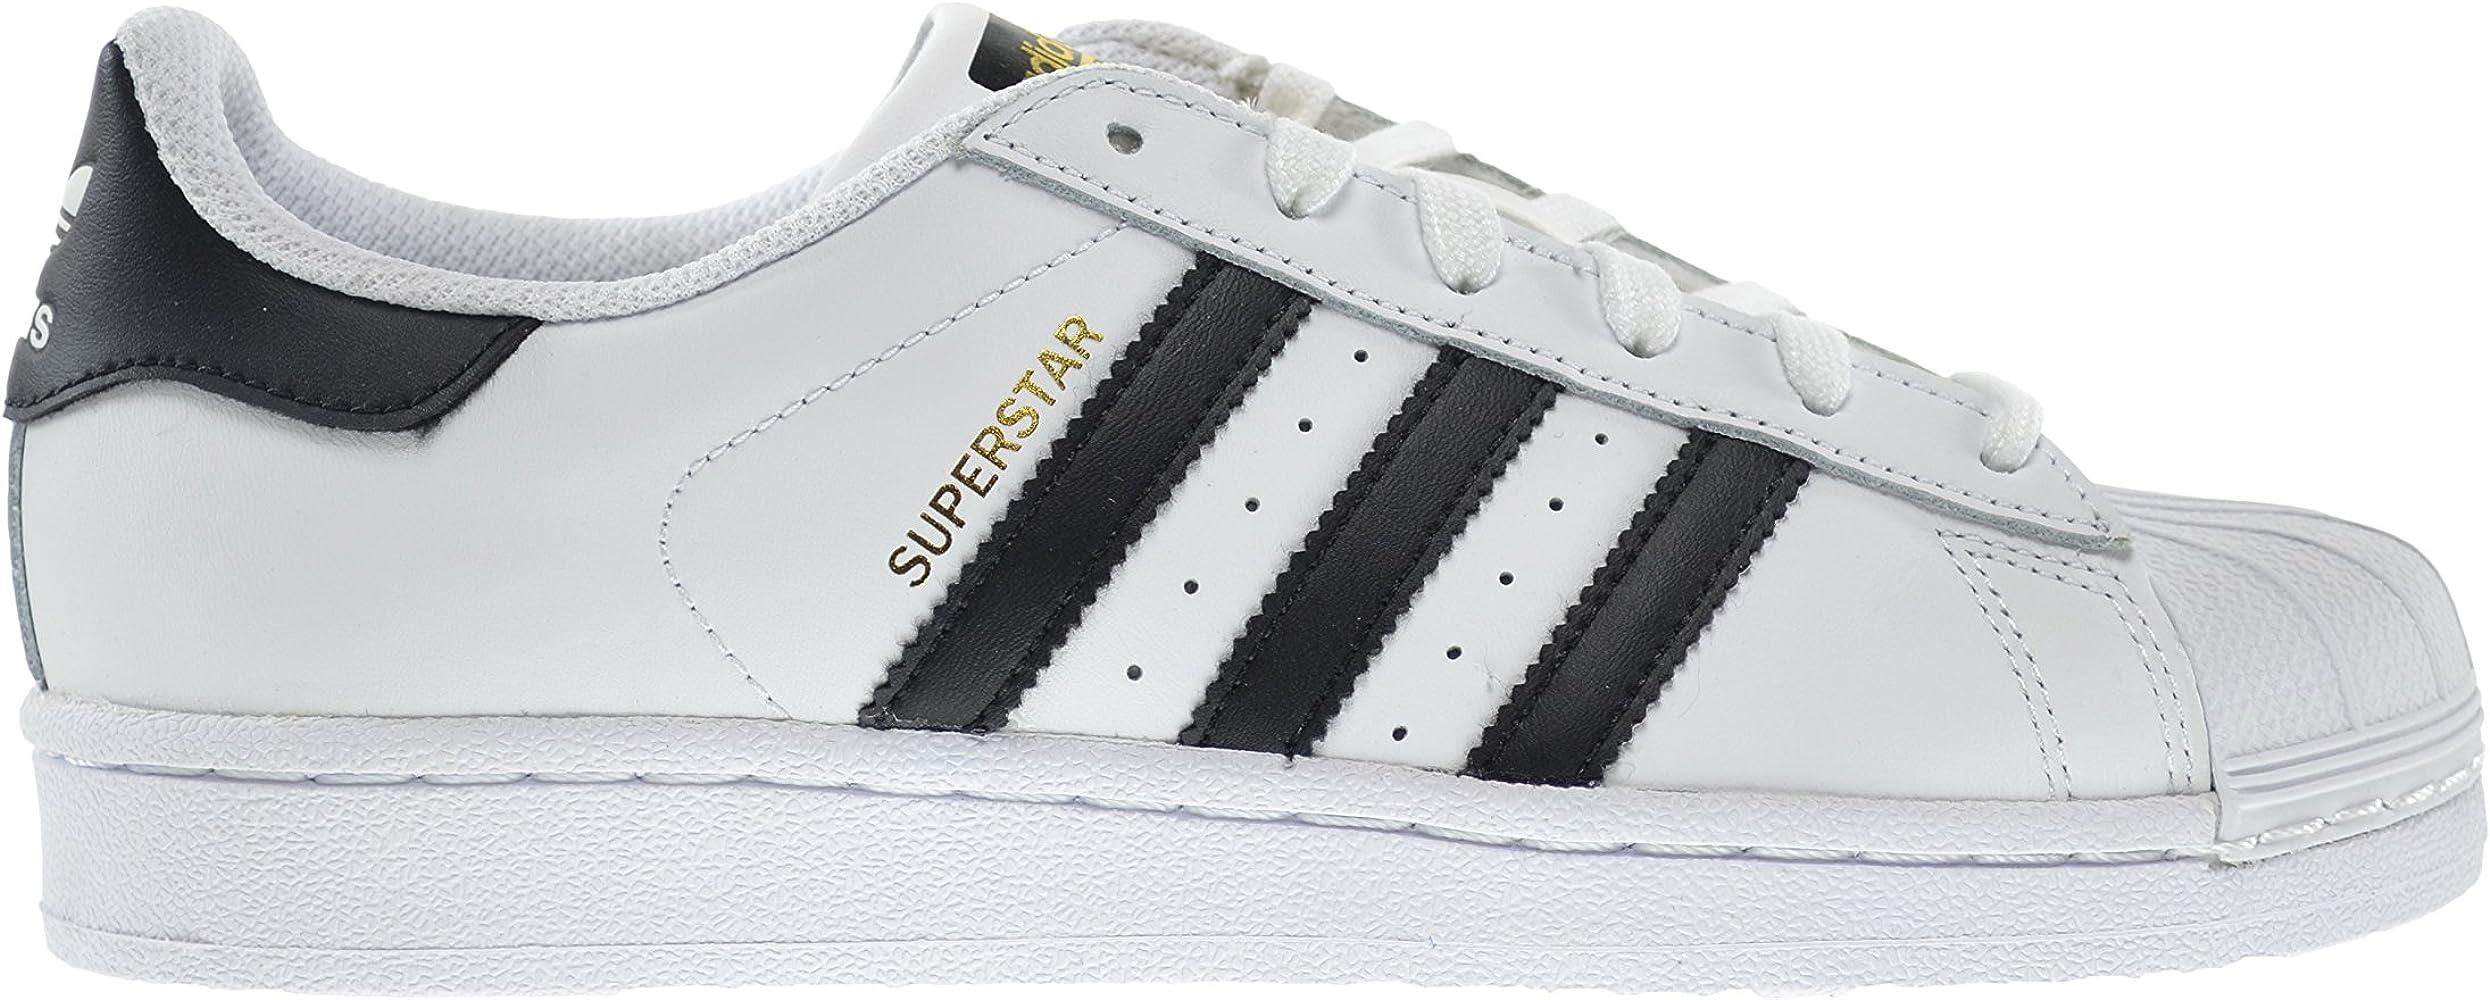 adidas Superstar J Big Kids Shoes